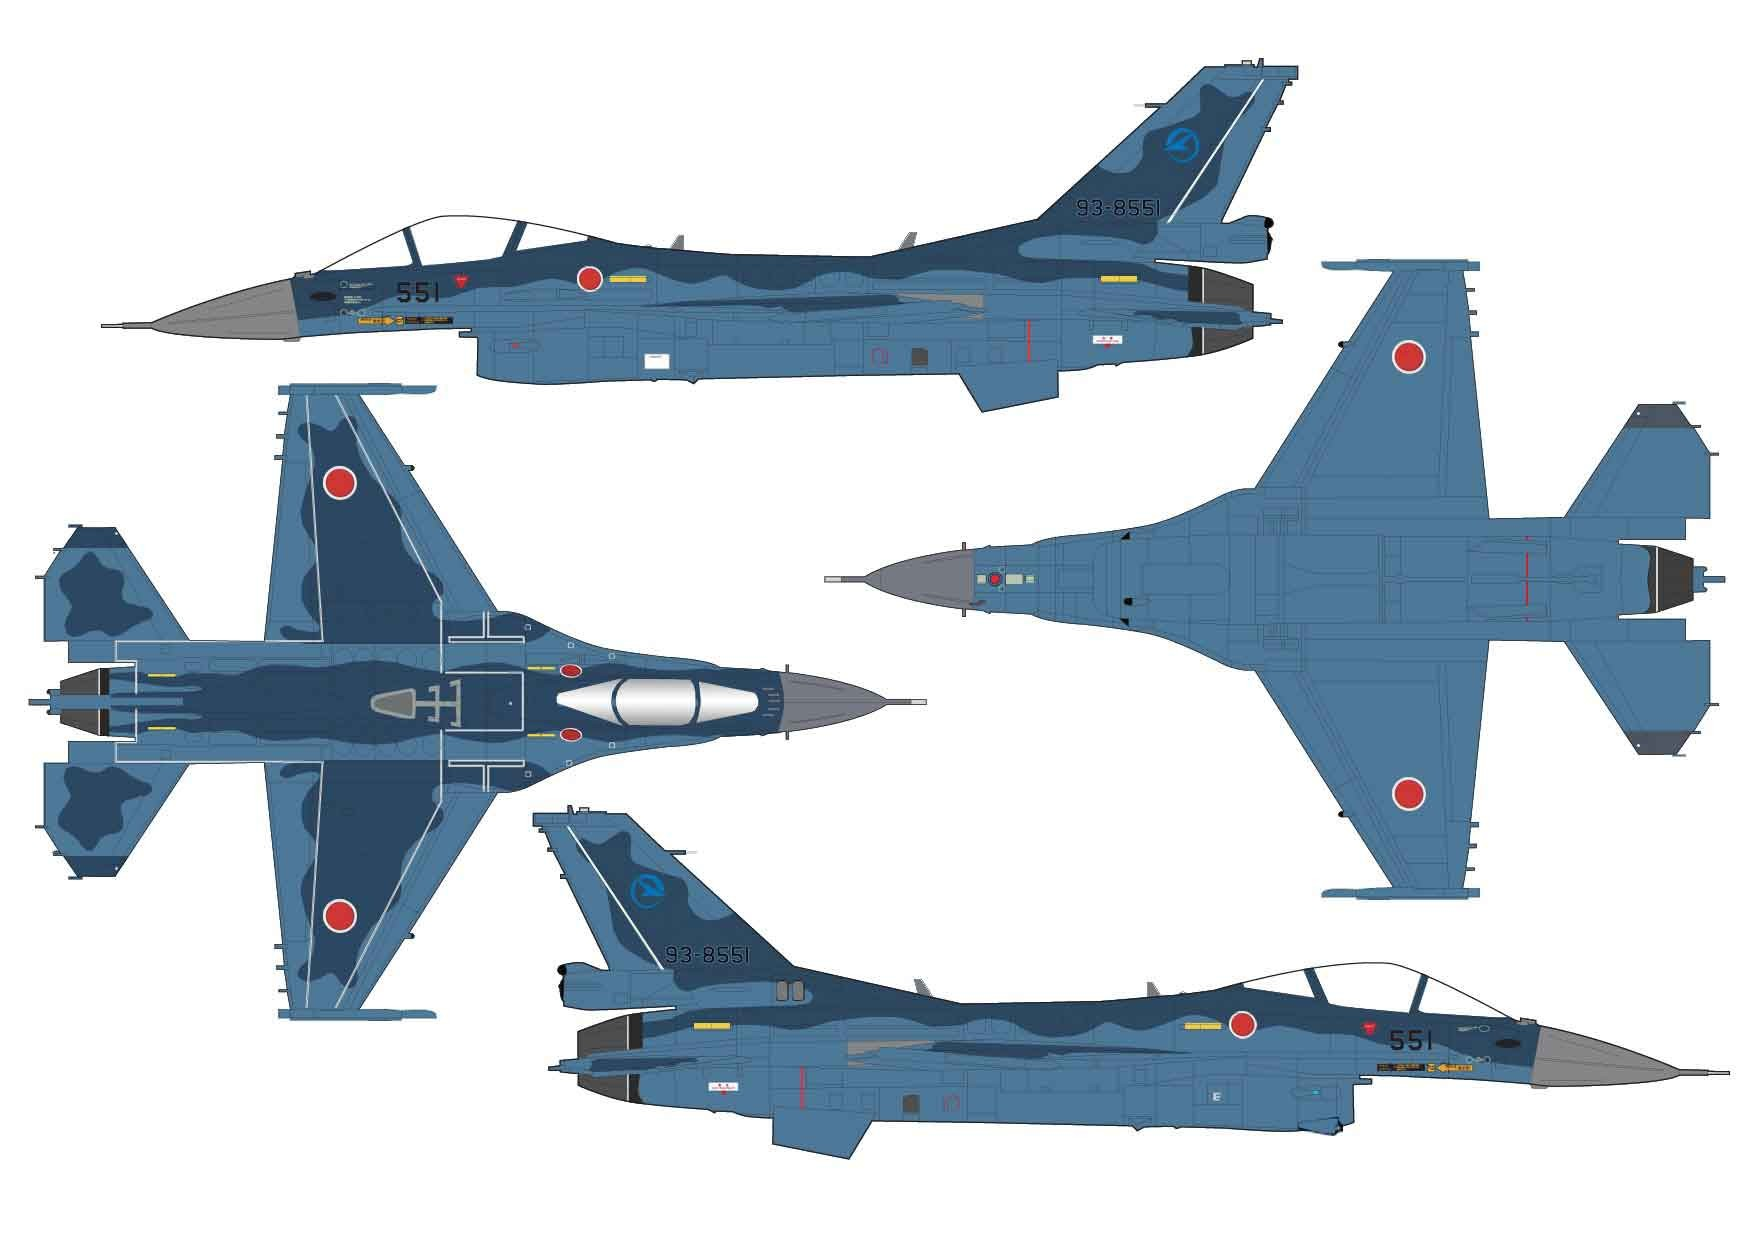 Mitsubishi F-2 – Japan | Thai Military and Asian Region